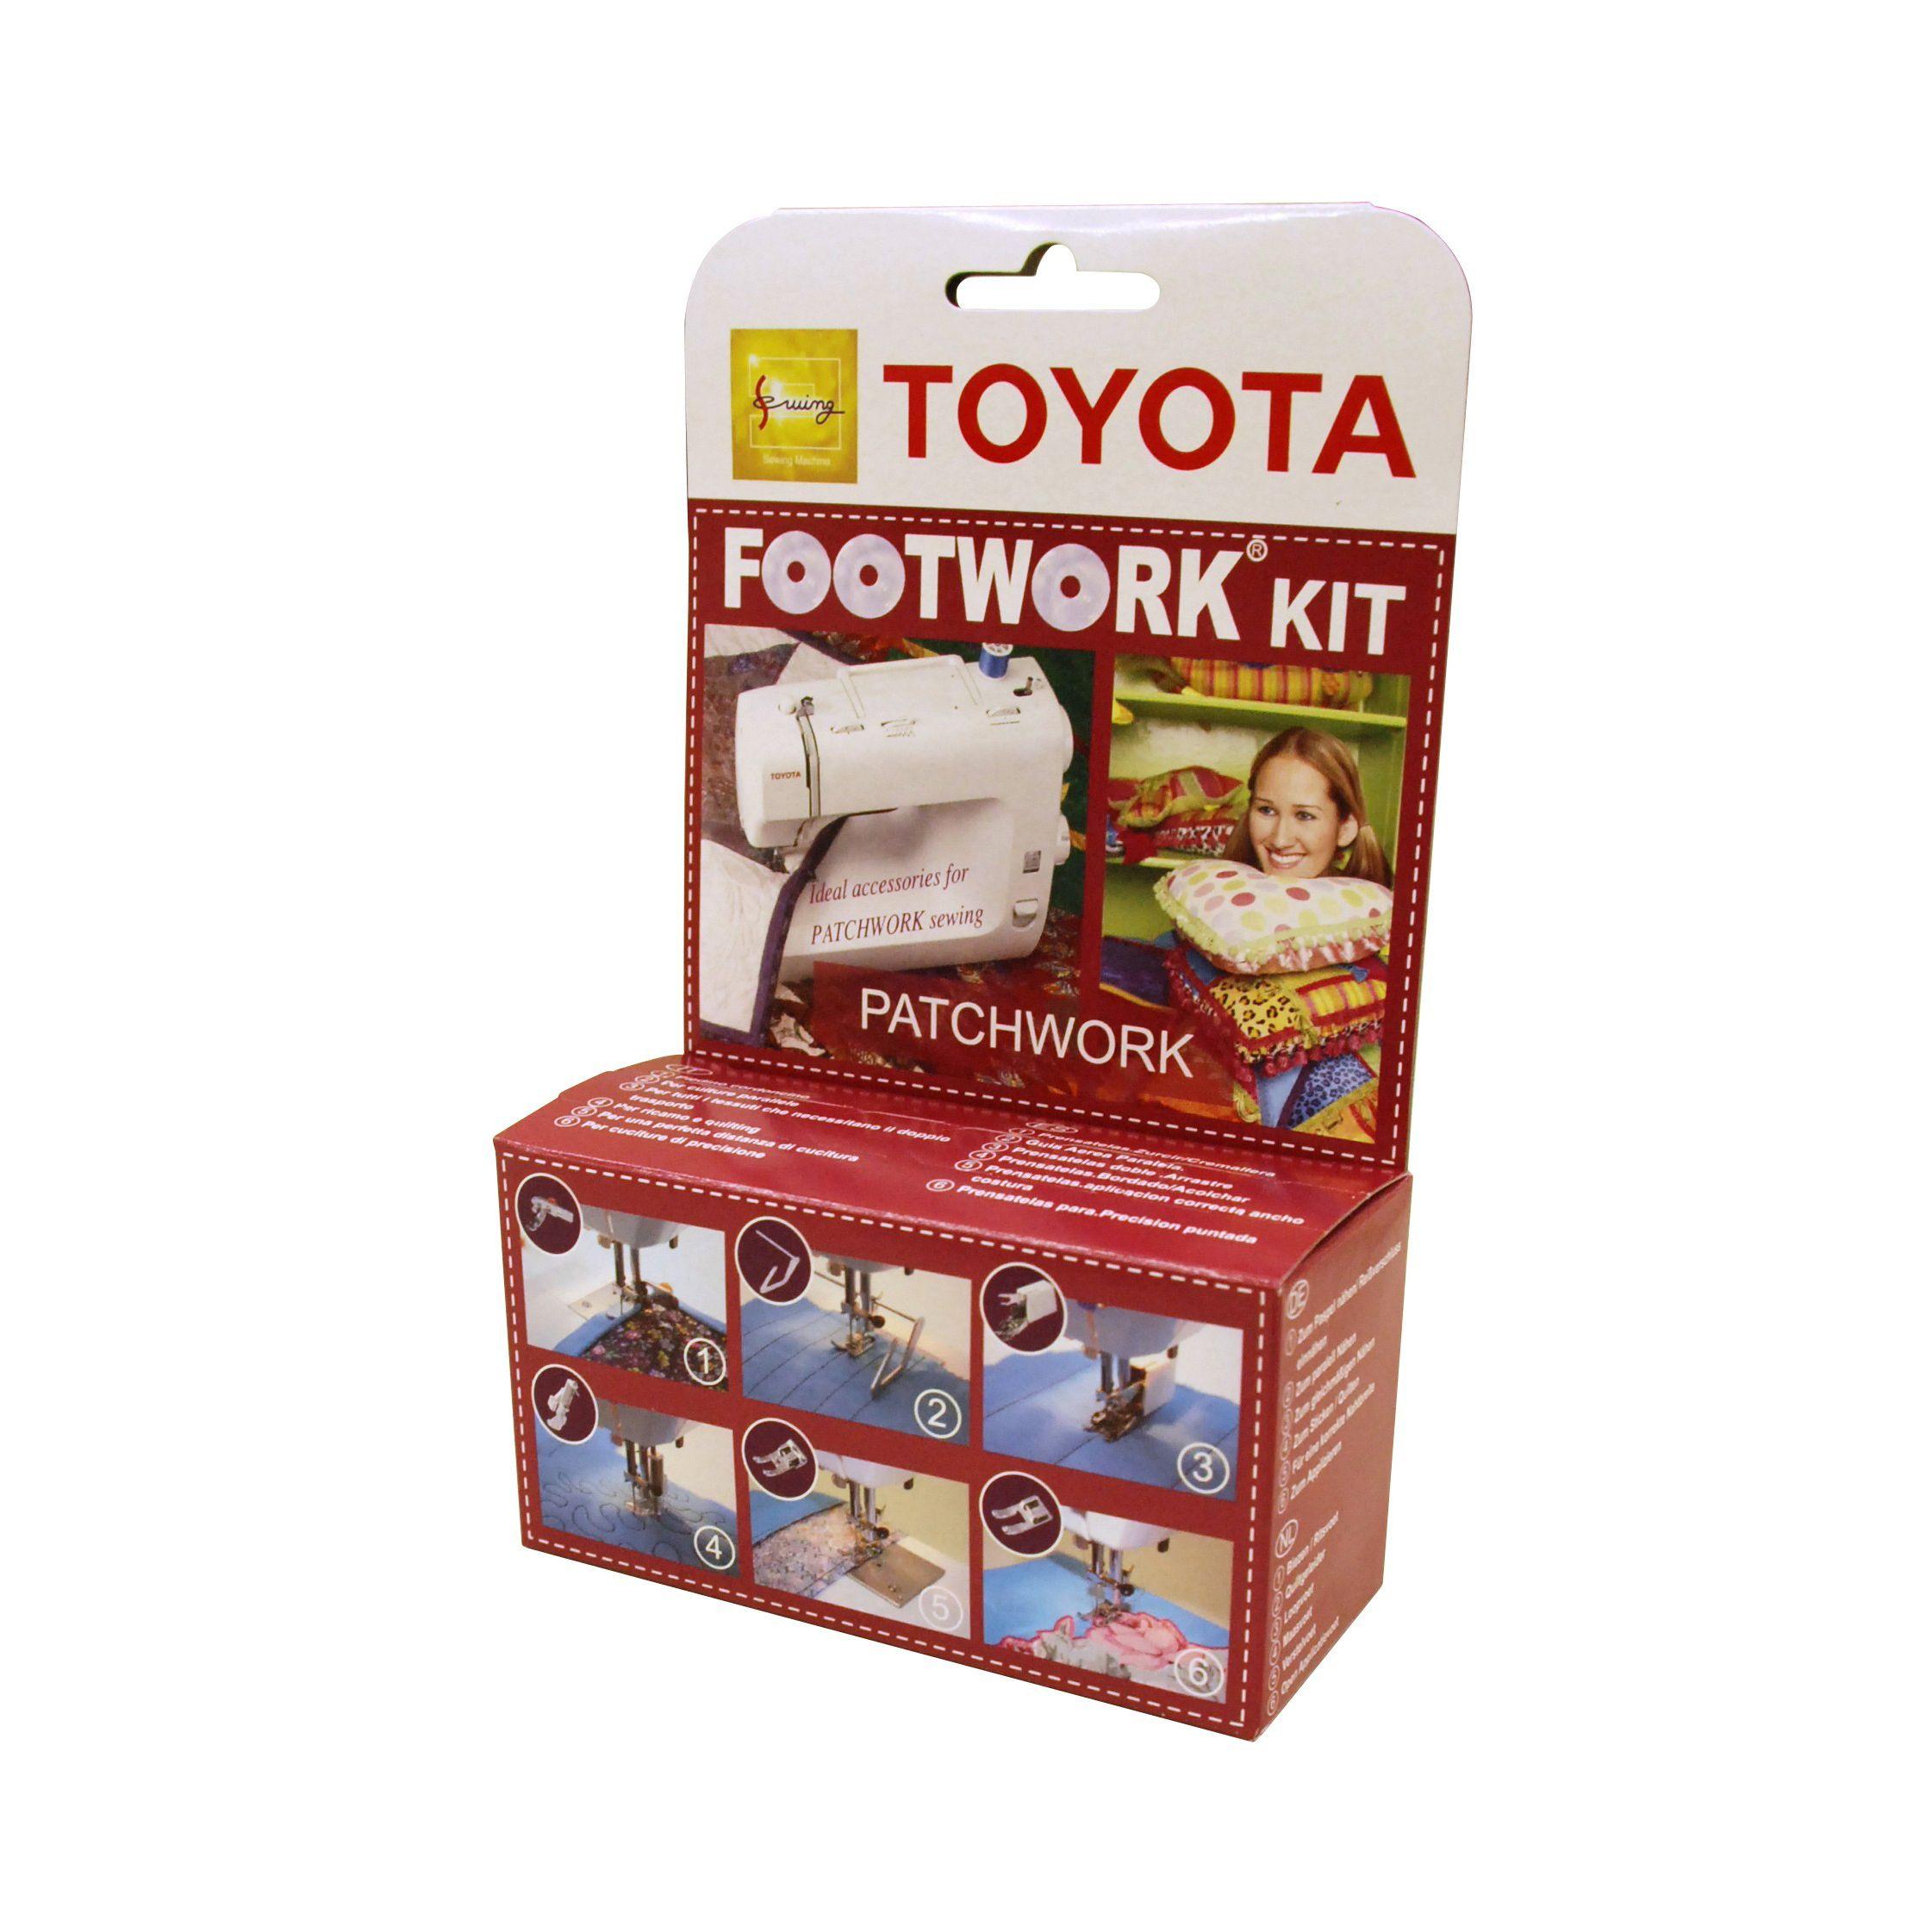 Toyota Sewing Machine Footwork Kit (Patchwork)